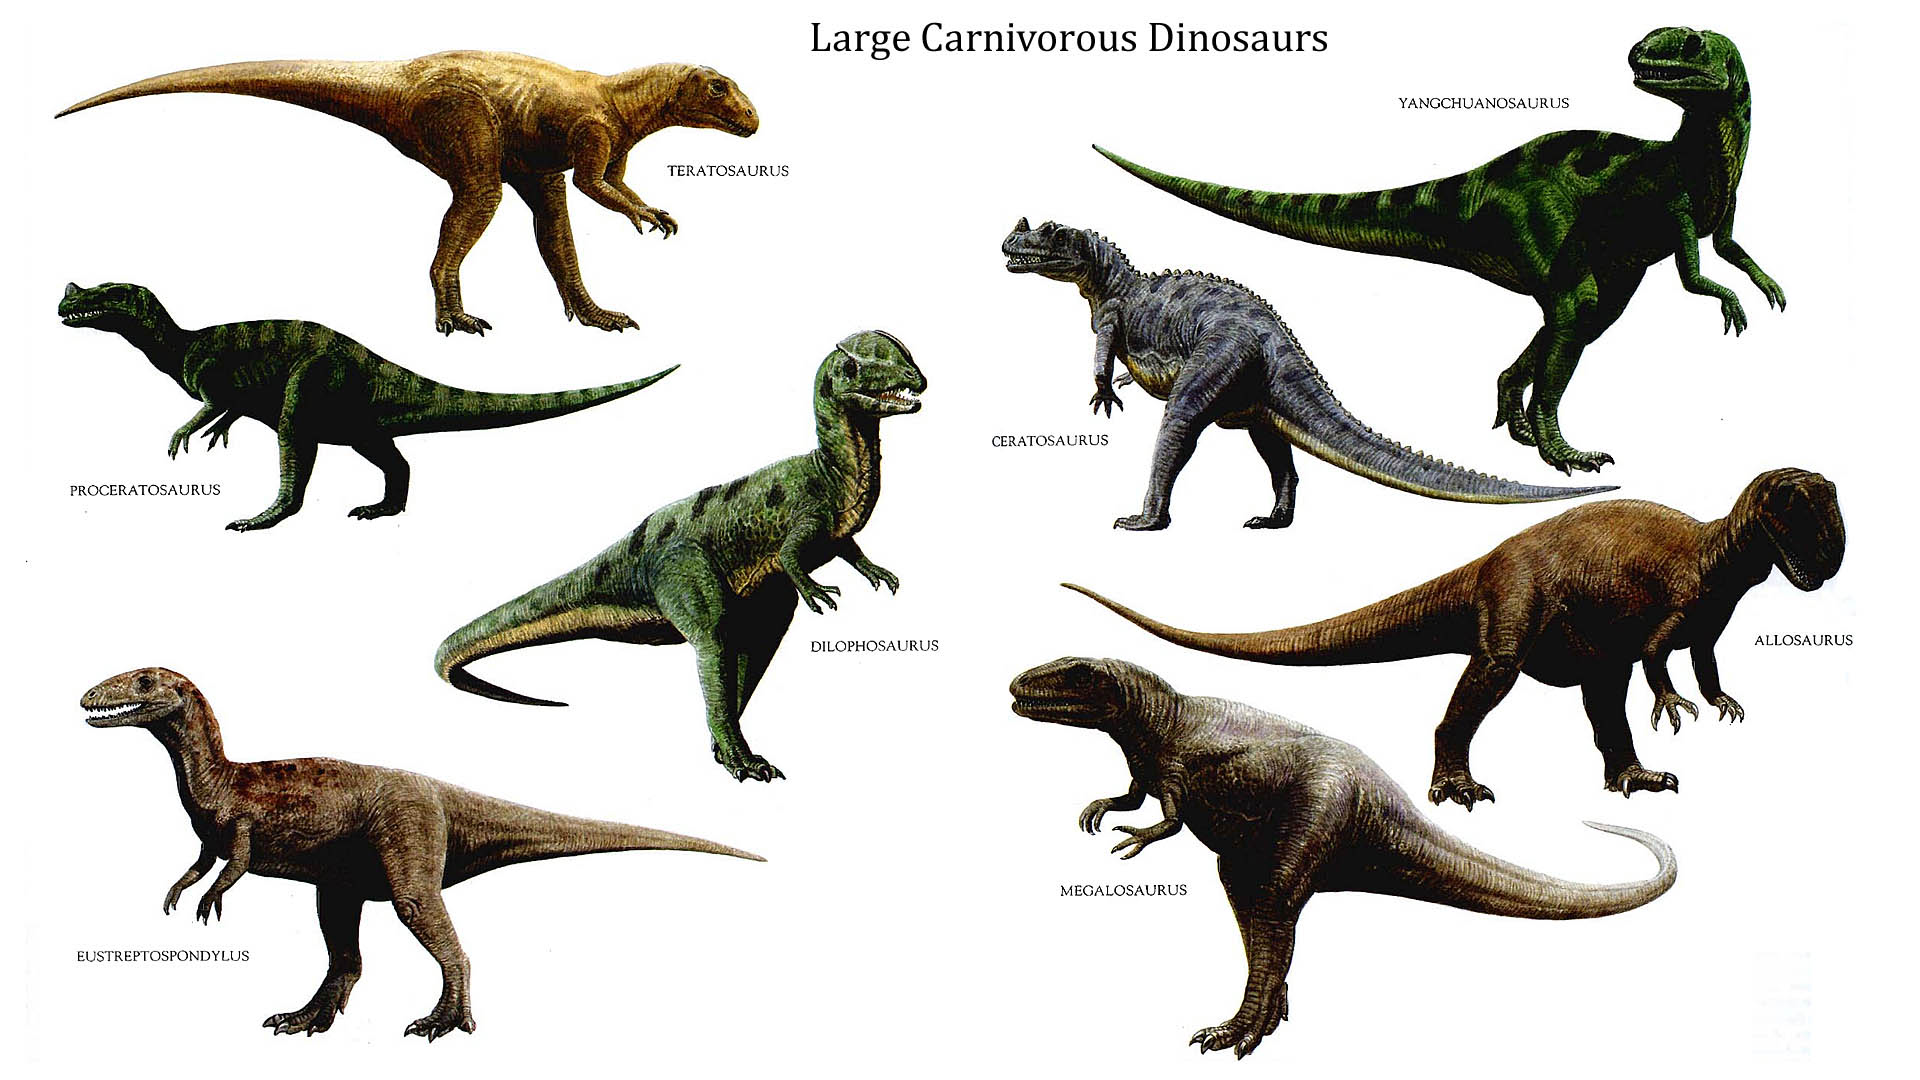 http//ayay.co.uk/background/dinosaurs/carnivore/large